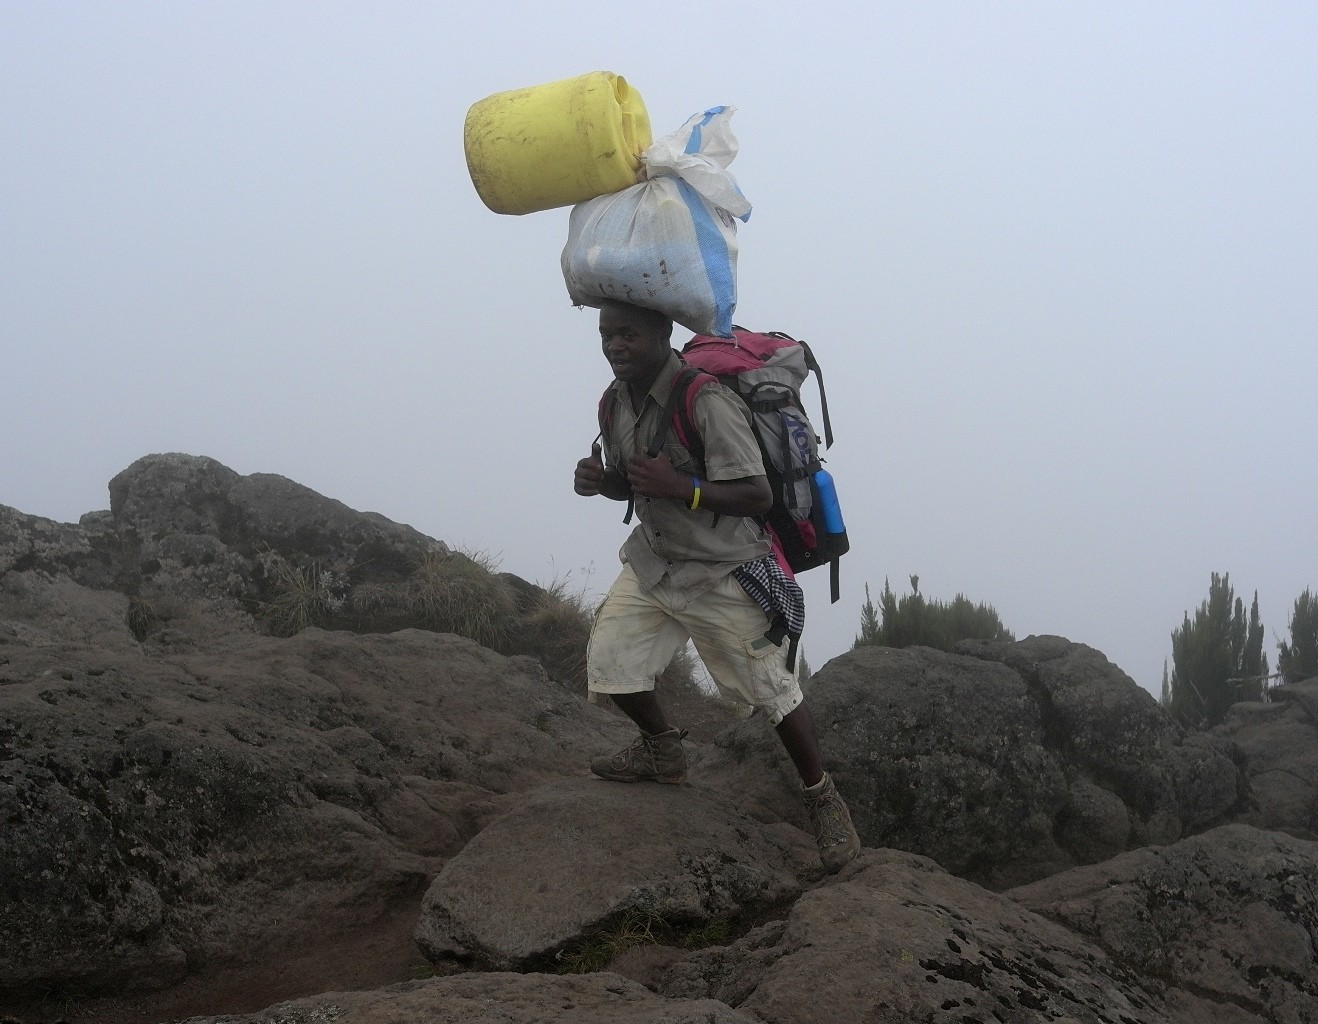 Porteur sur la voie Machame - Kilimanjaro - Tanzanie.